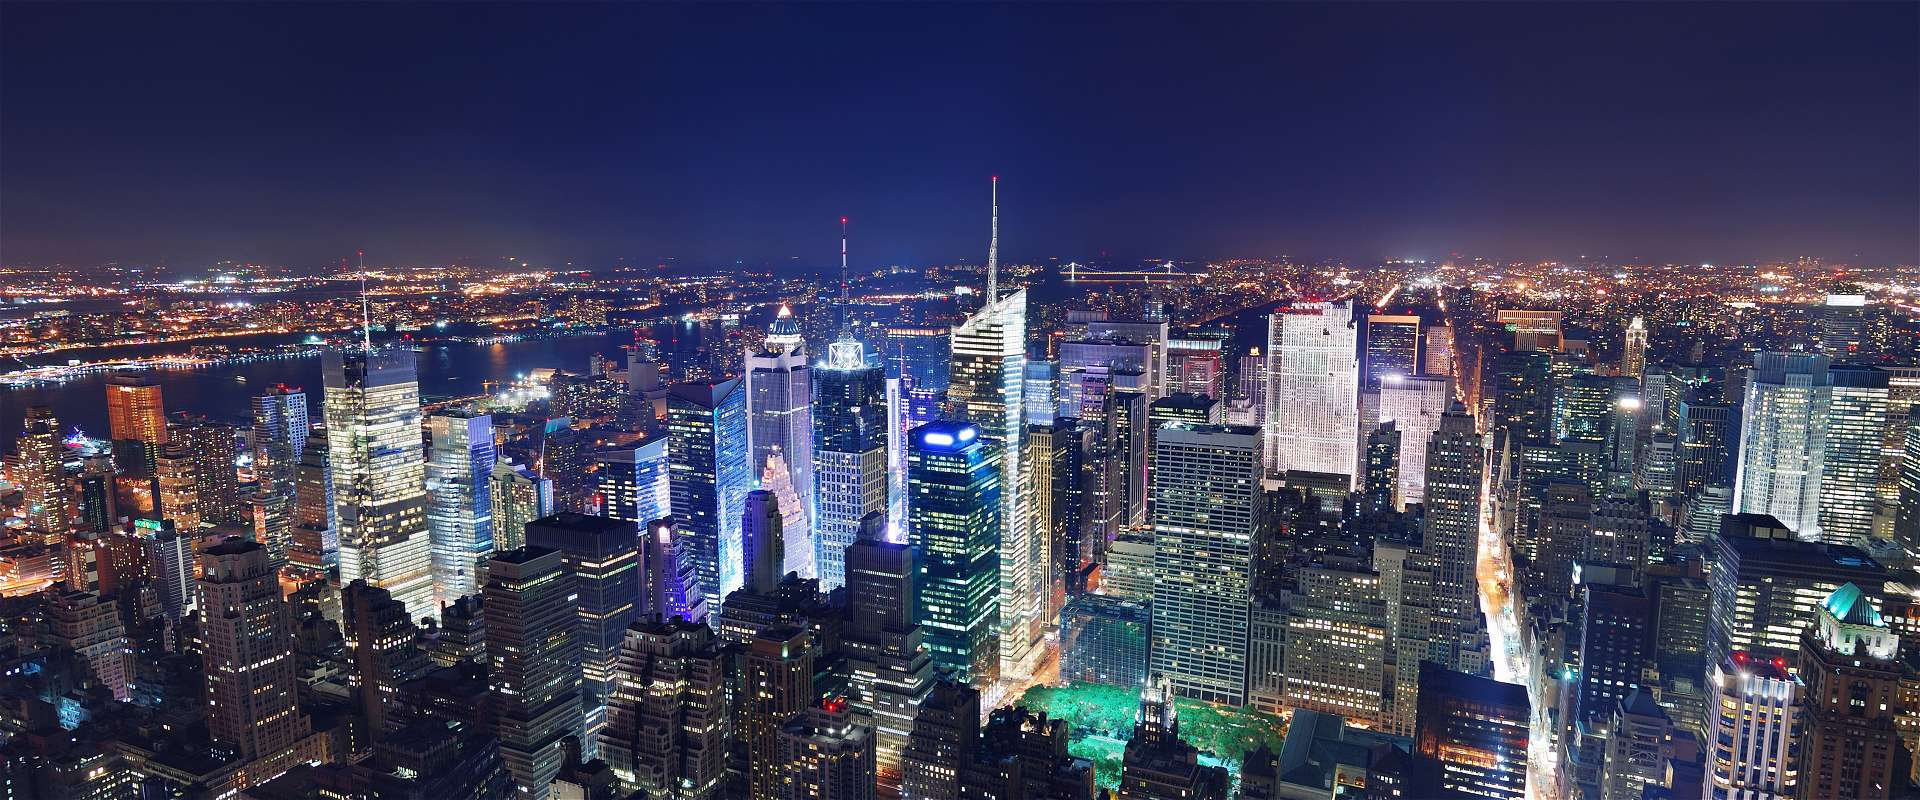 new-york-city-8